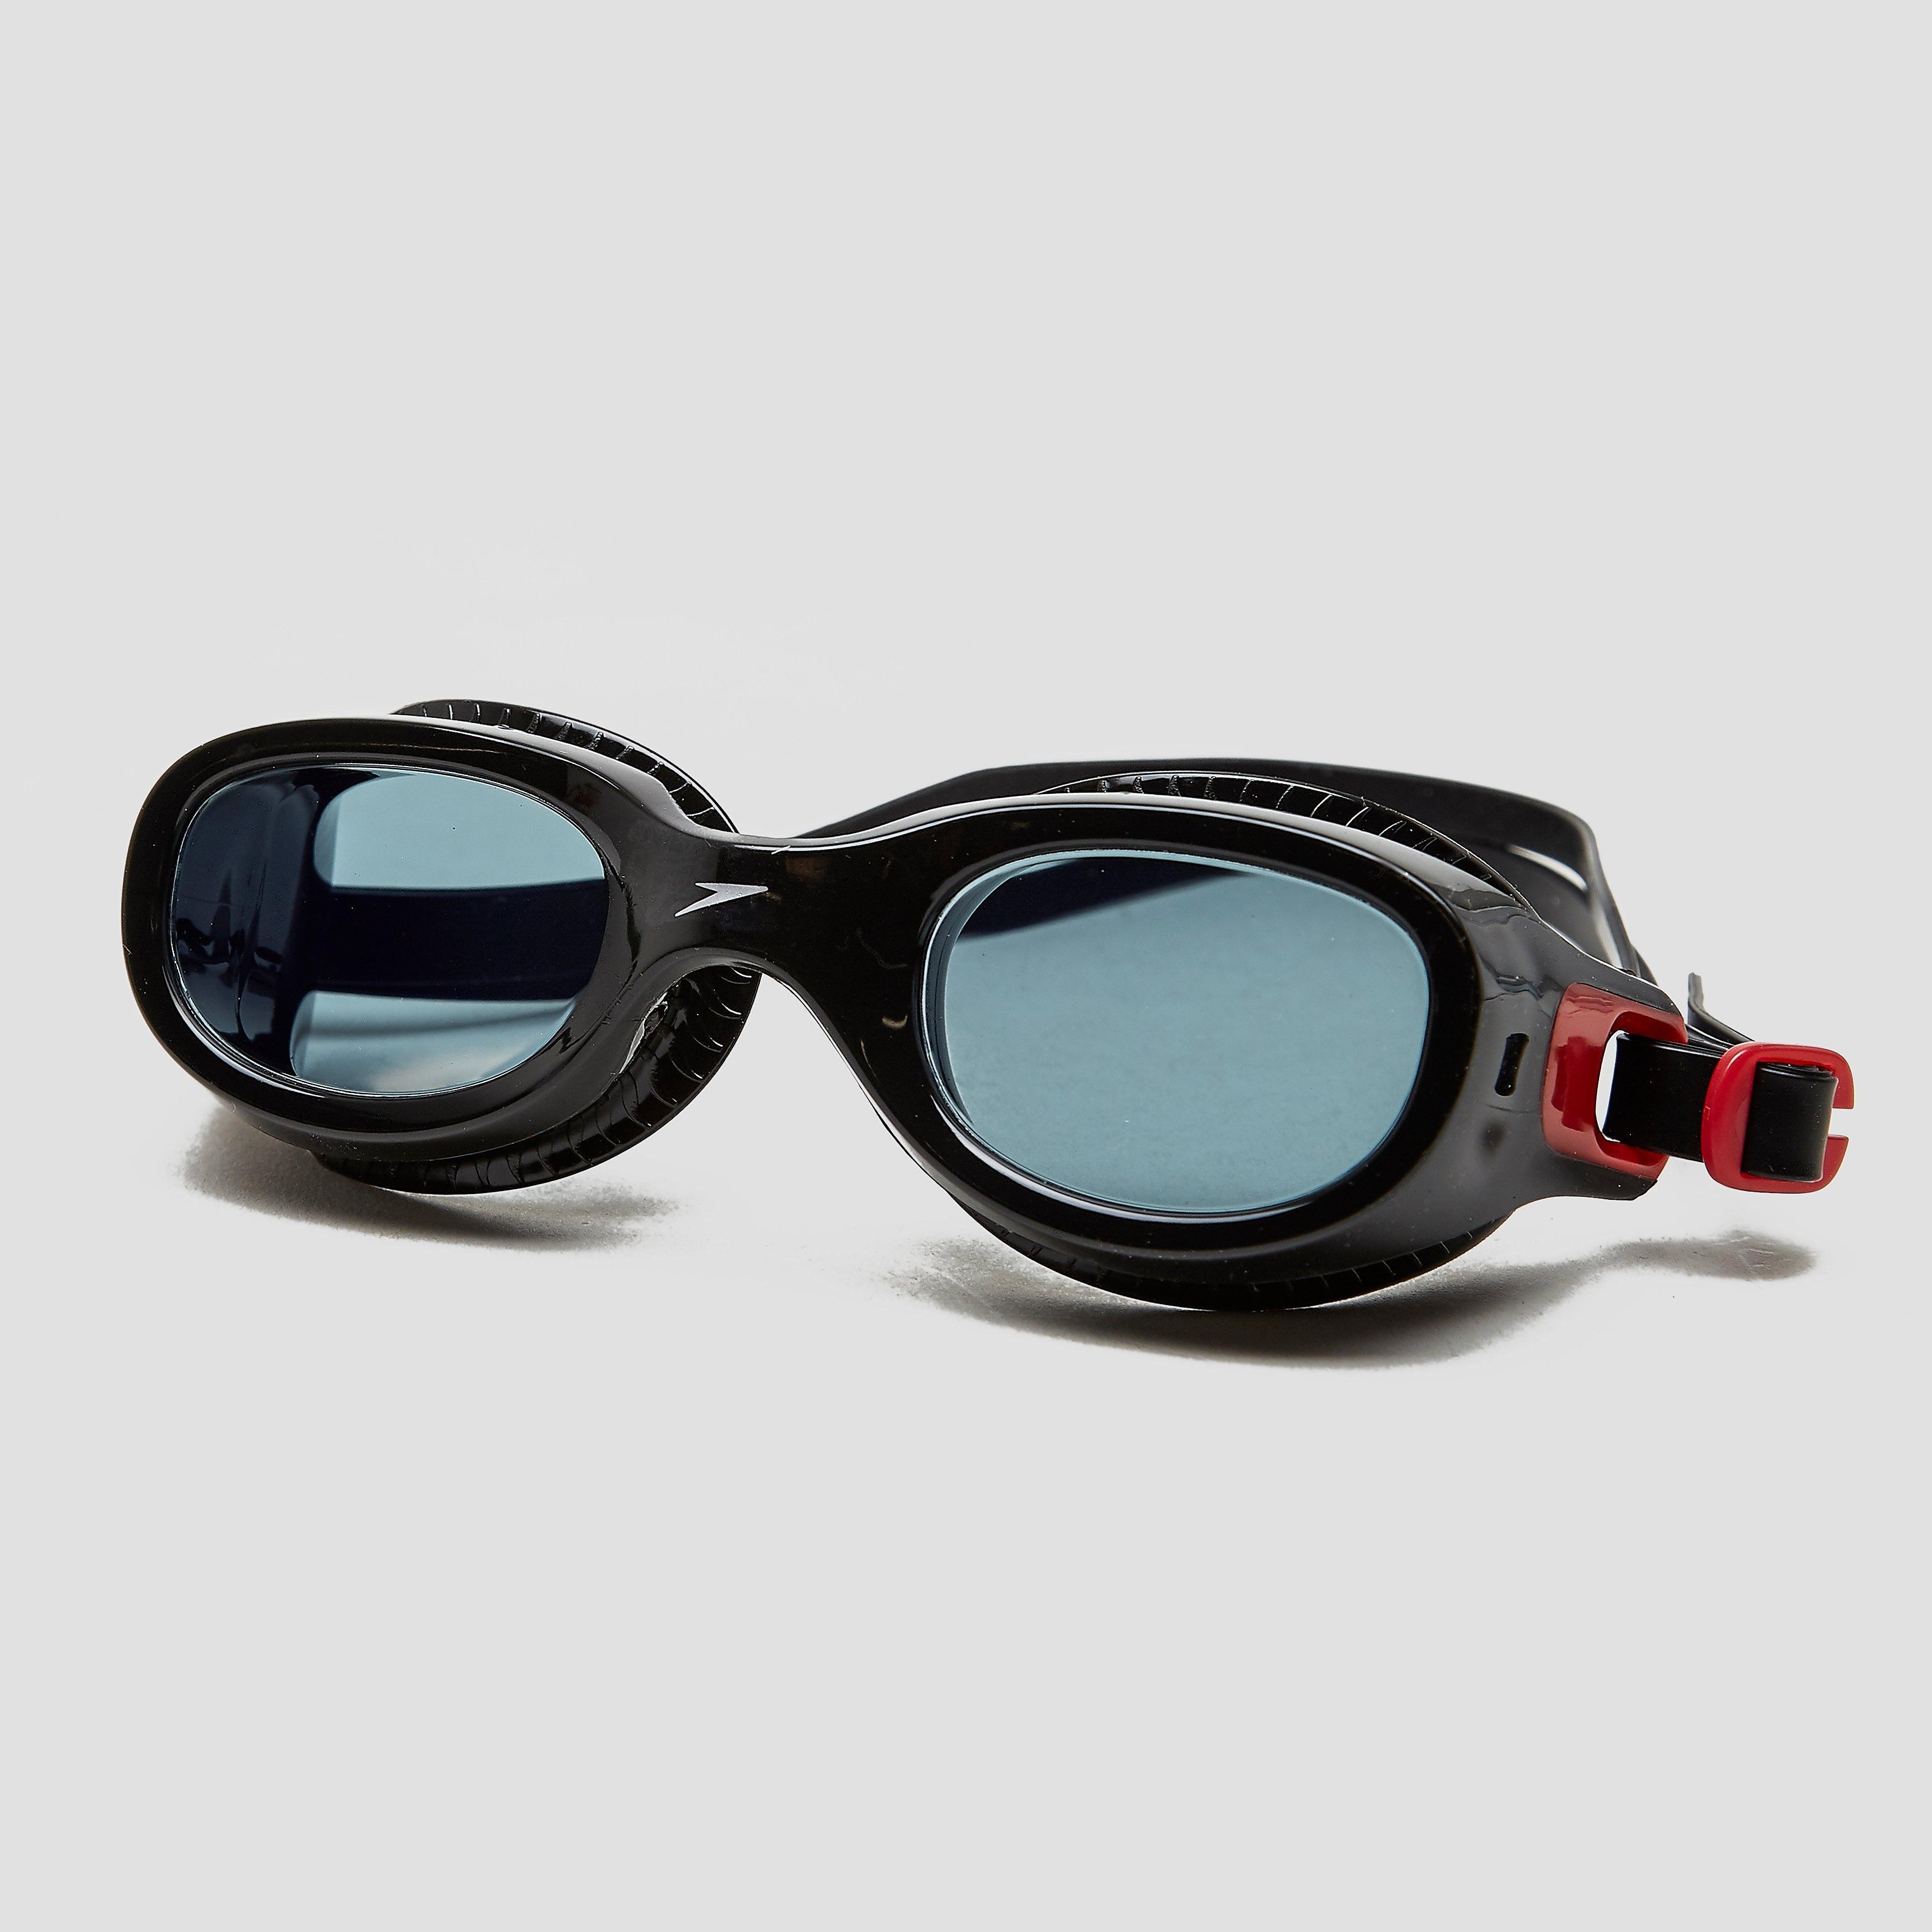 Futura classic zwembril zwart/rood